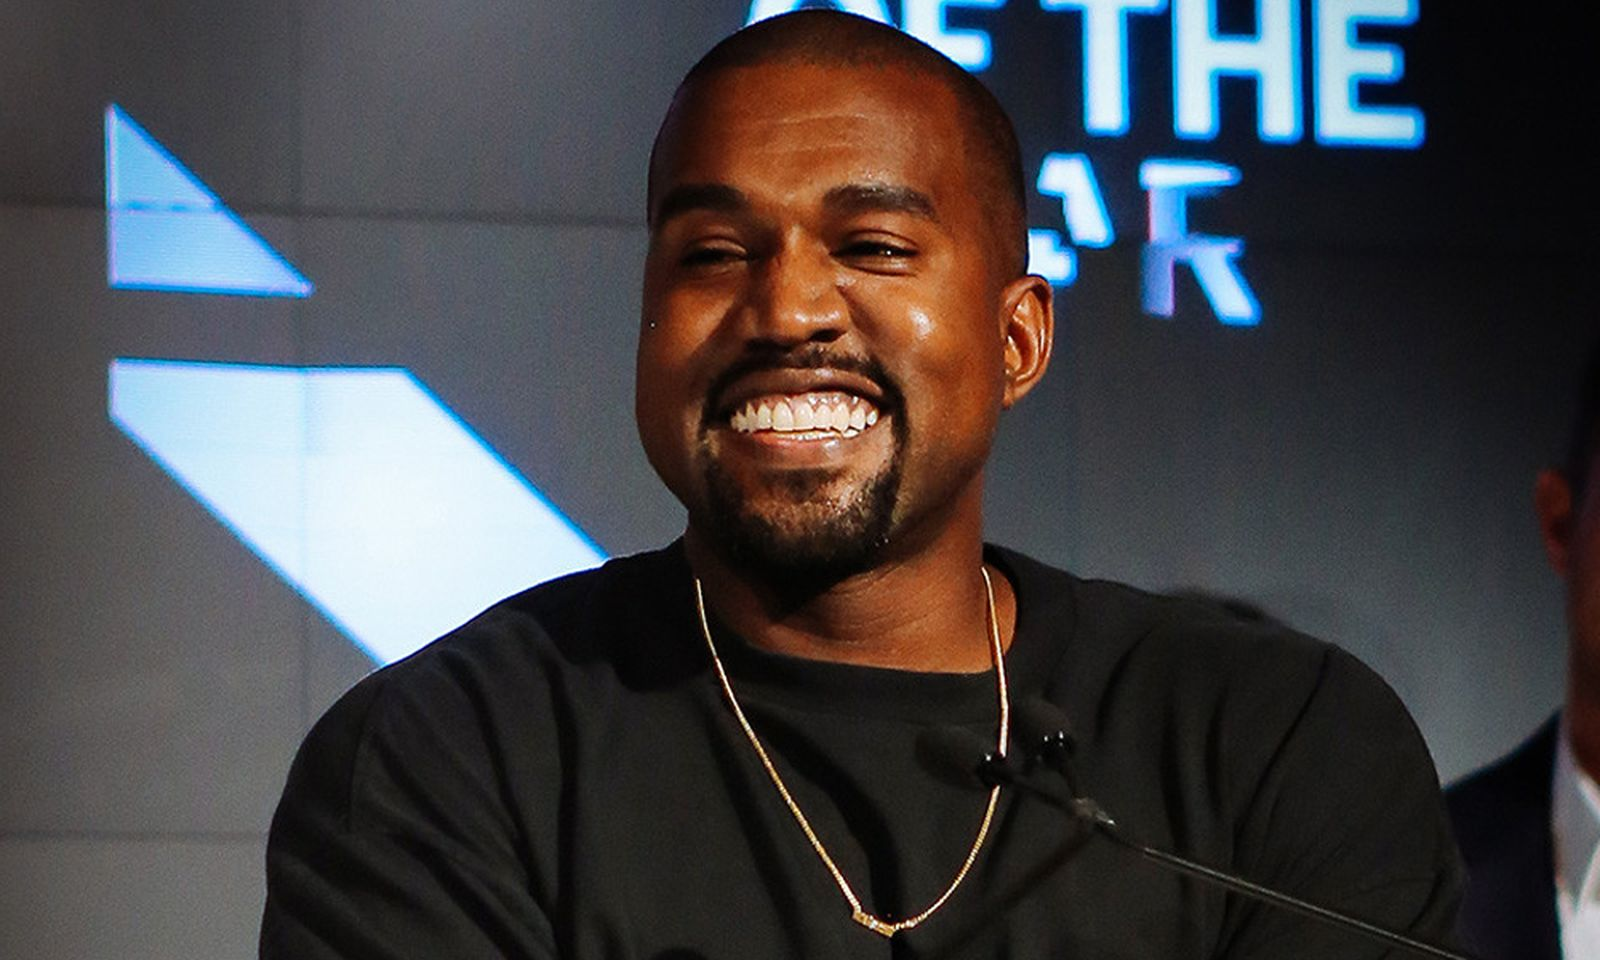 Comments Adidas Balenciaga Chance the Rapper